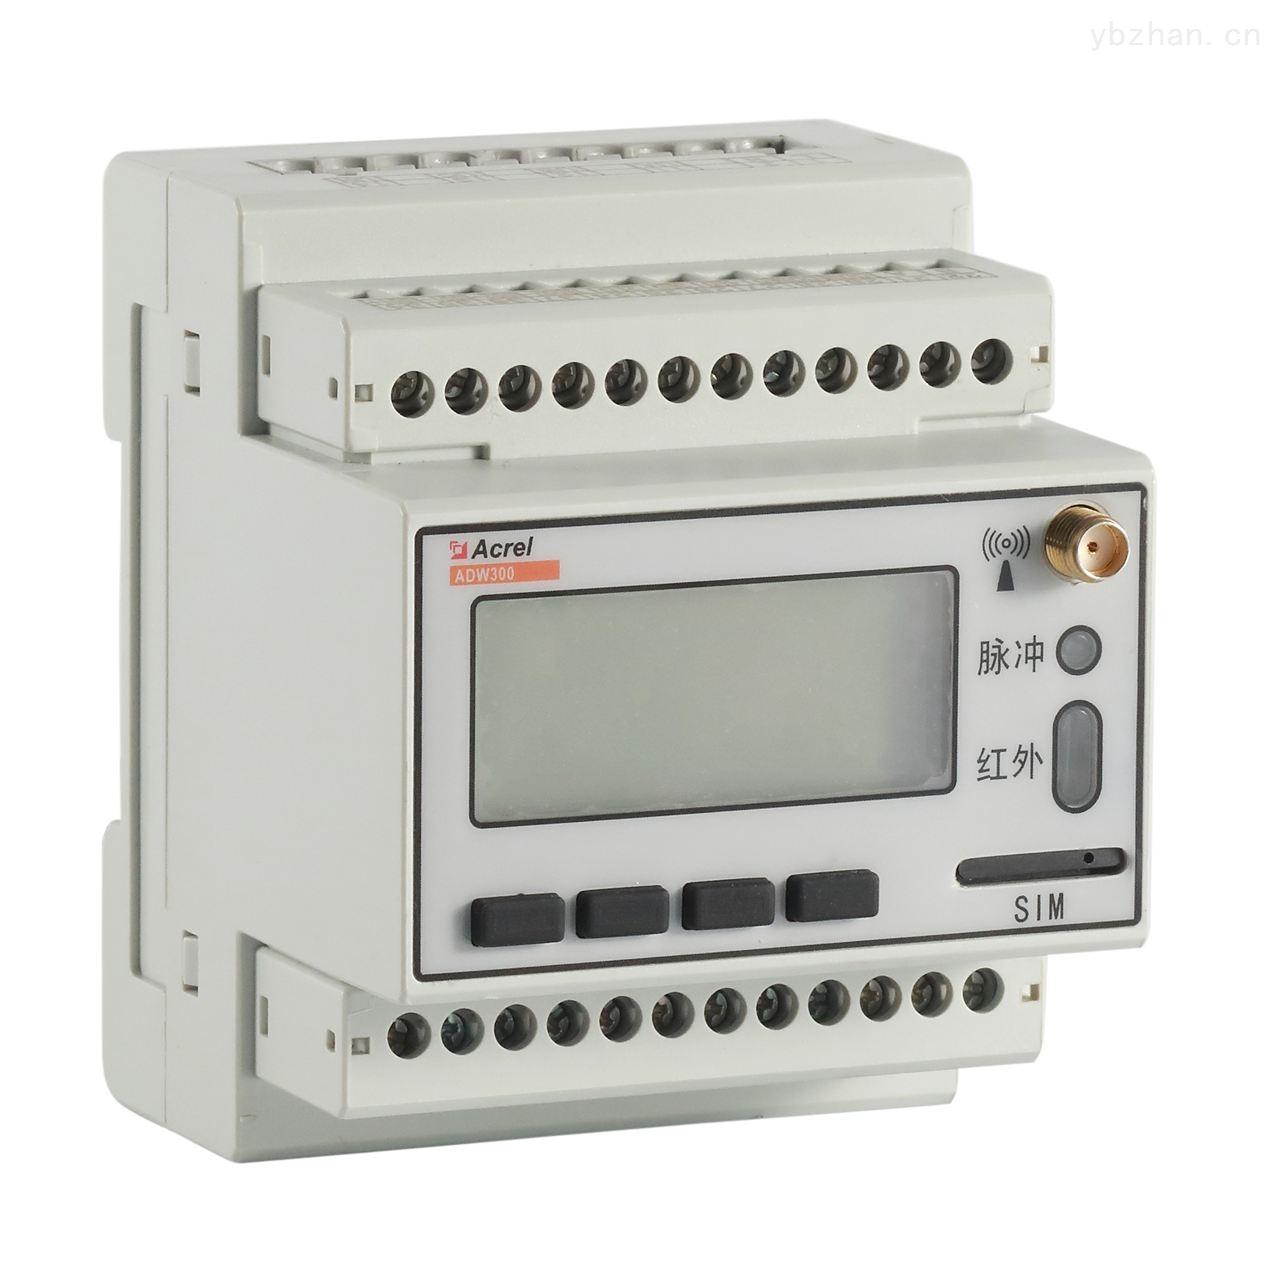 ADW300-安科瑞ADW300無線計量儀表 分表計電電能表